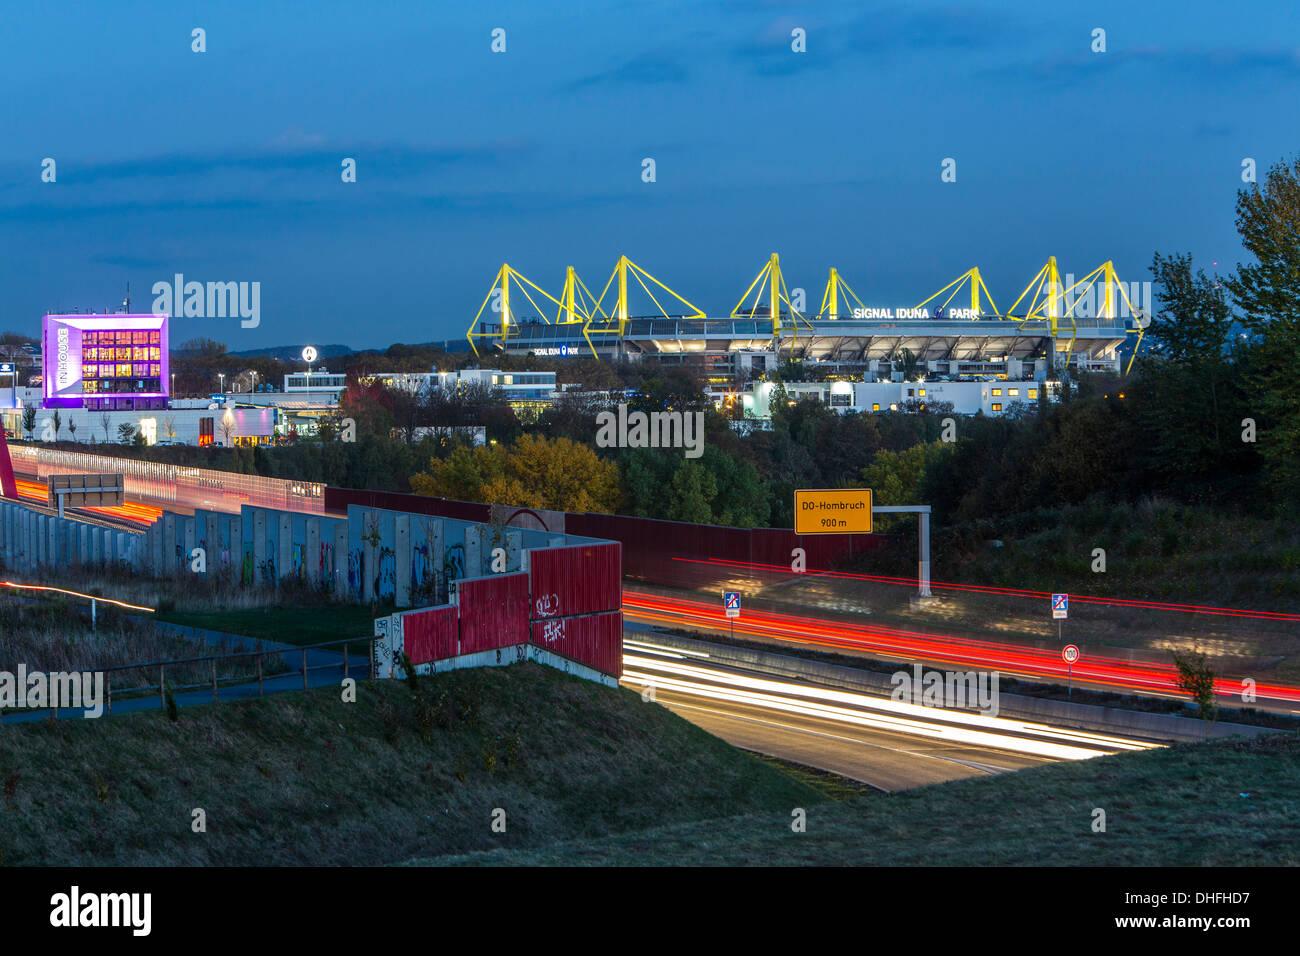 City skyline of Dortmund, Germany. Motorway, Autobahn A40, football stadium of Borussia Dortmund, BVB, Bundesliga. - Stock Image